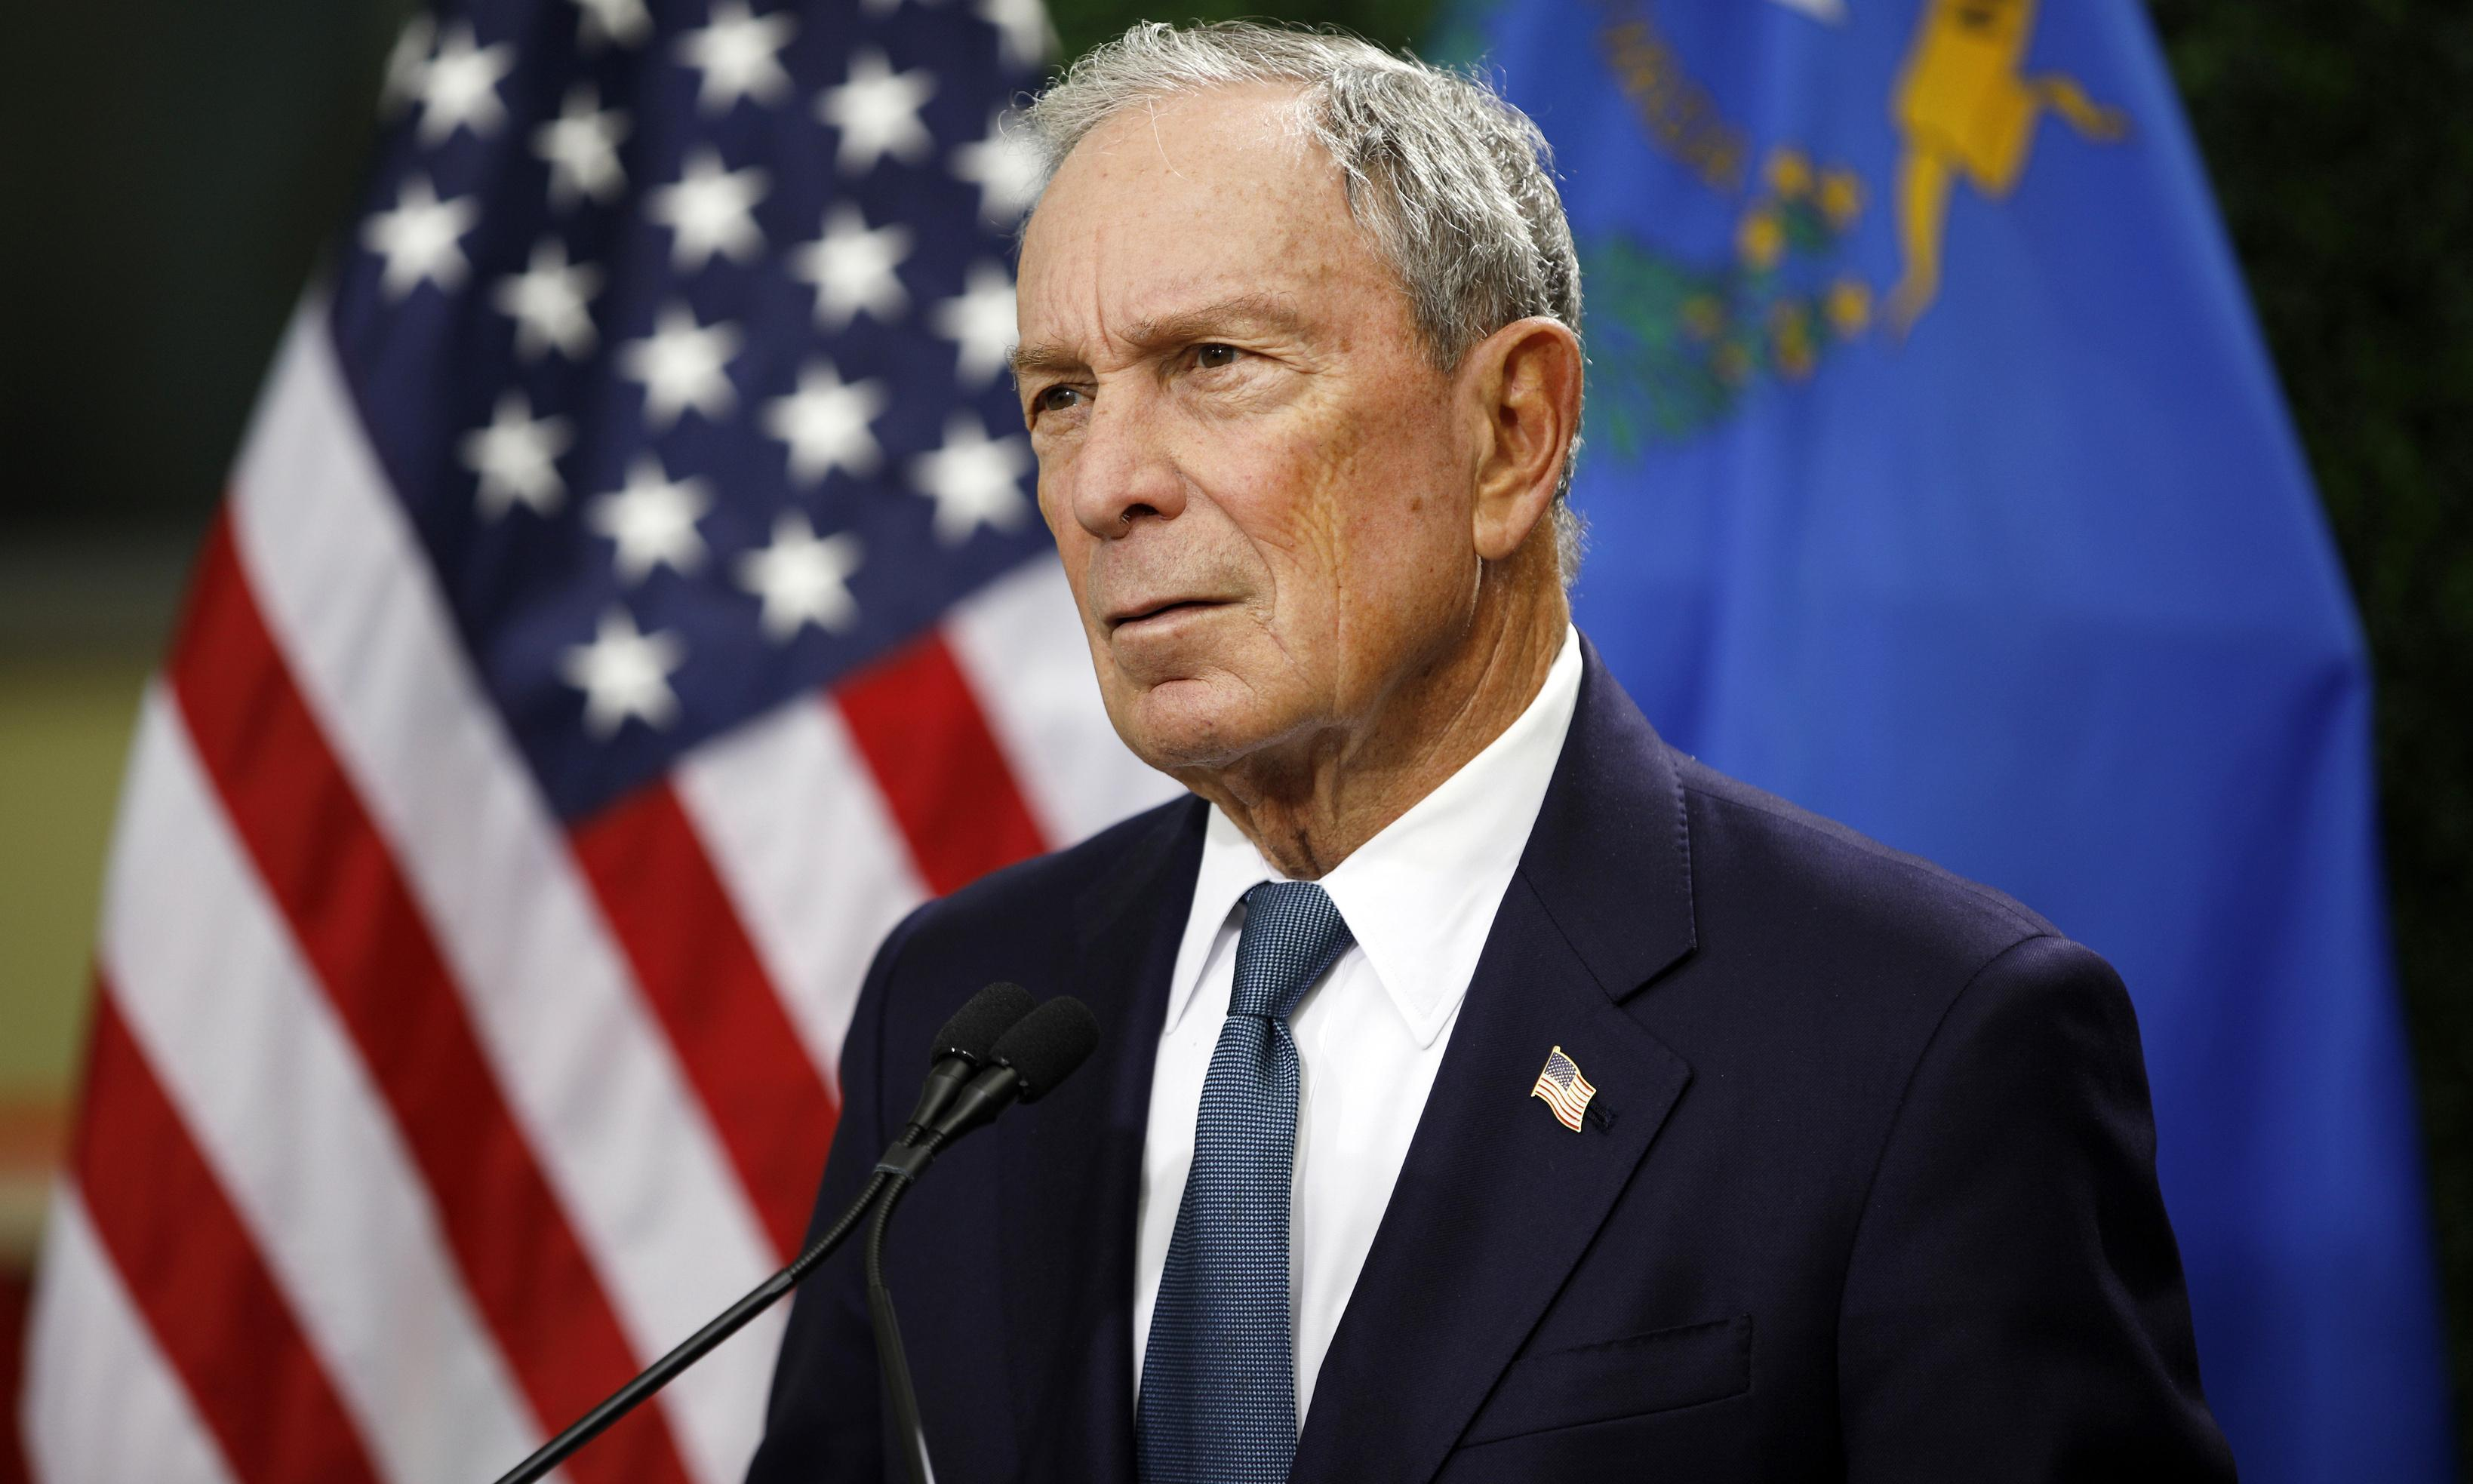 Michael Bloomberg: billionaire eyes centre lane in Democratic presidential race